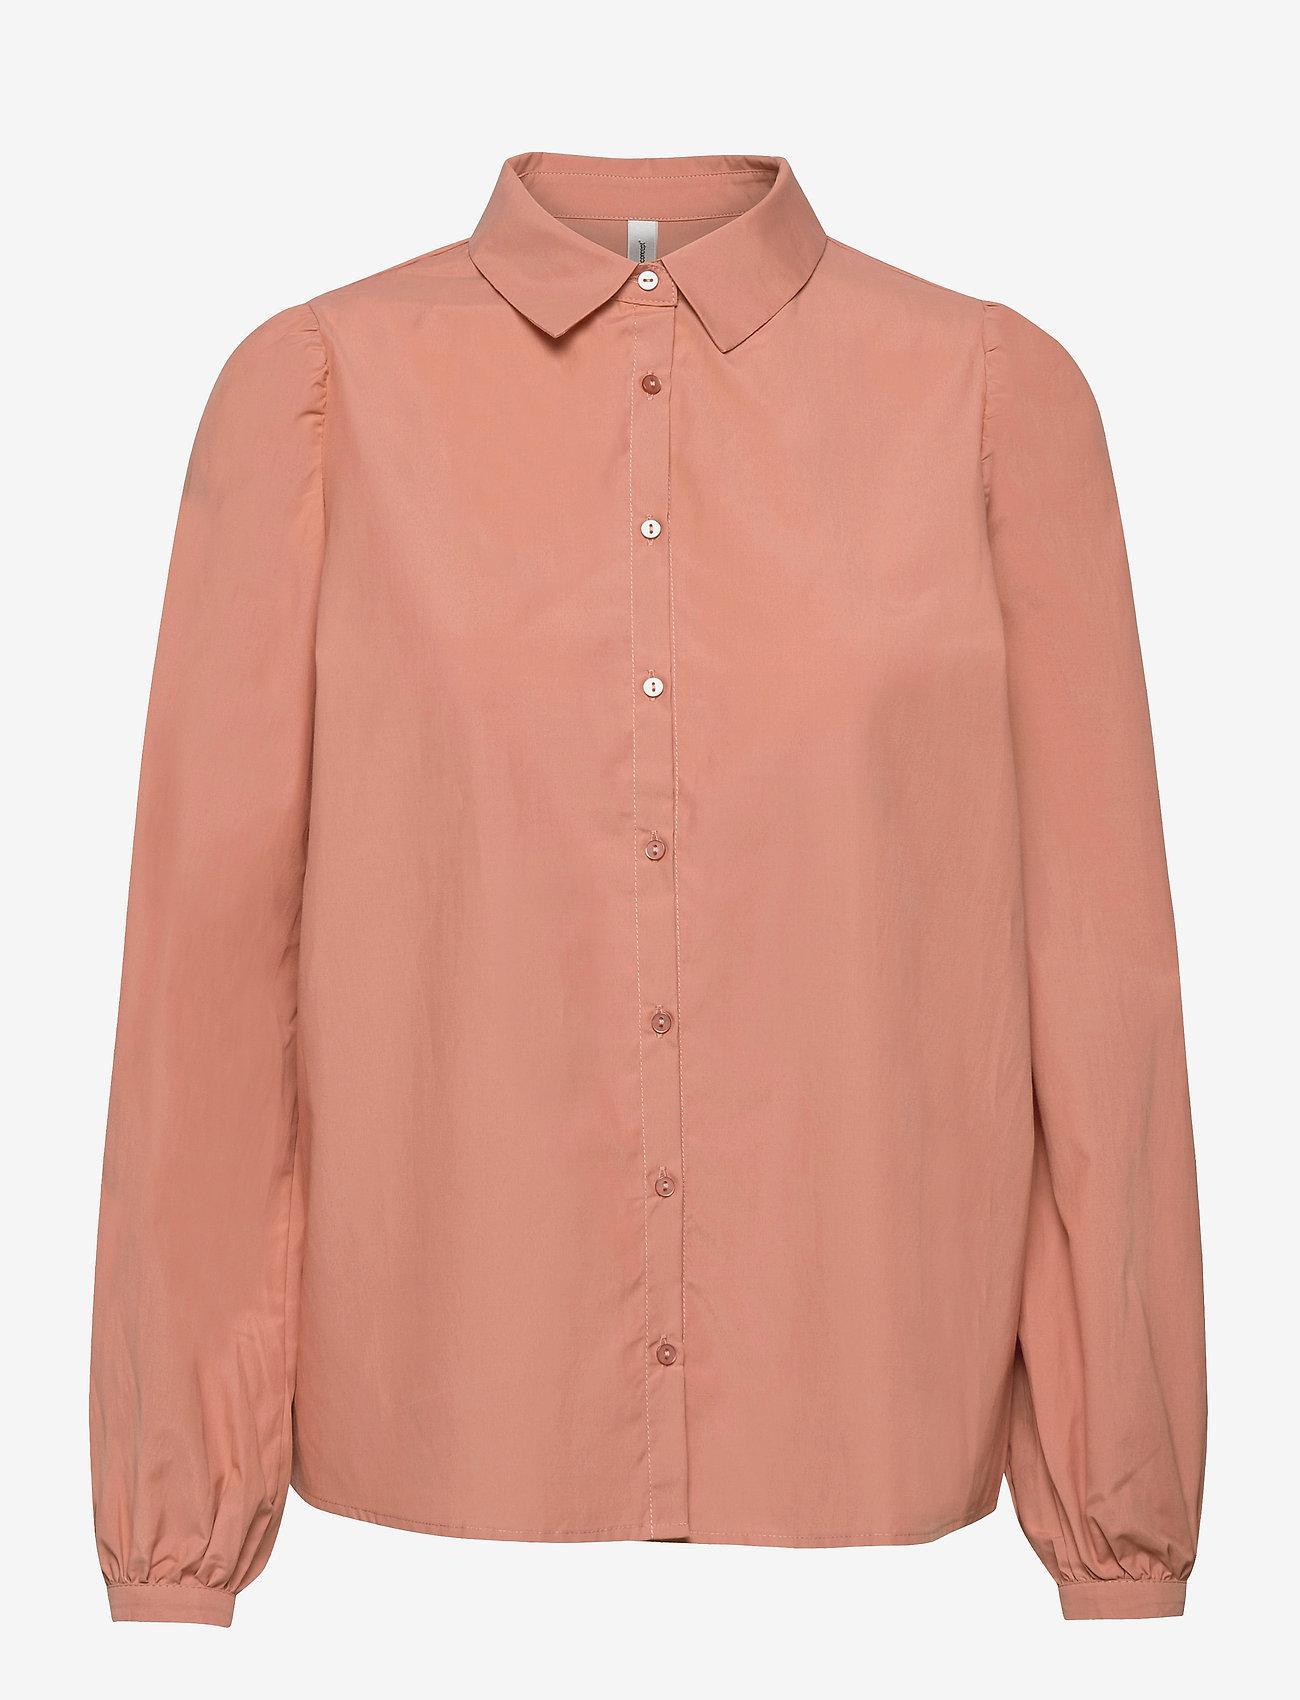 Soyaconcept - SC-NETTI - long-sleeved shirts - rose dawn - 0